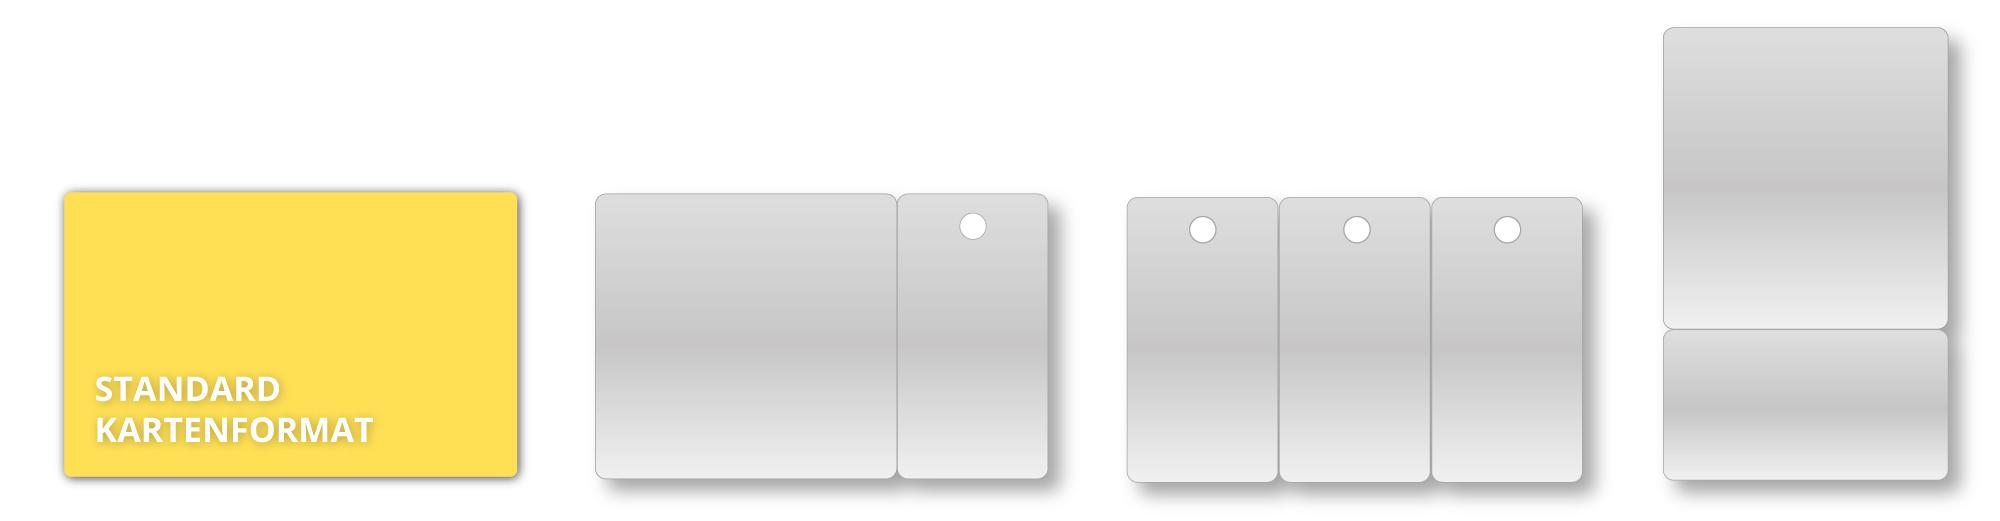 Keytagformen - GermanCard